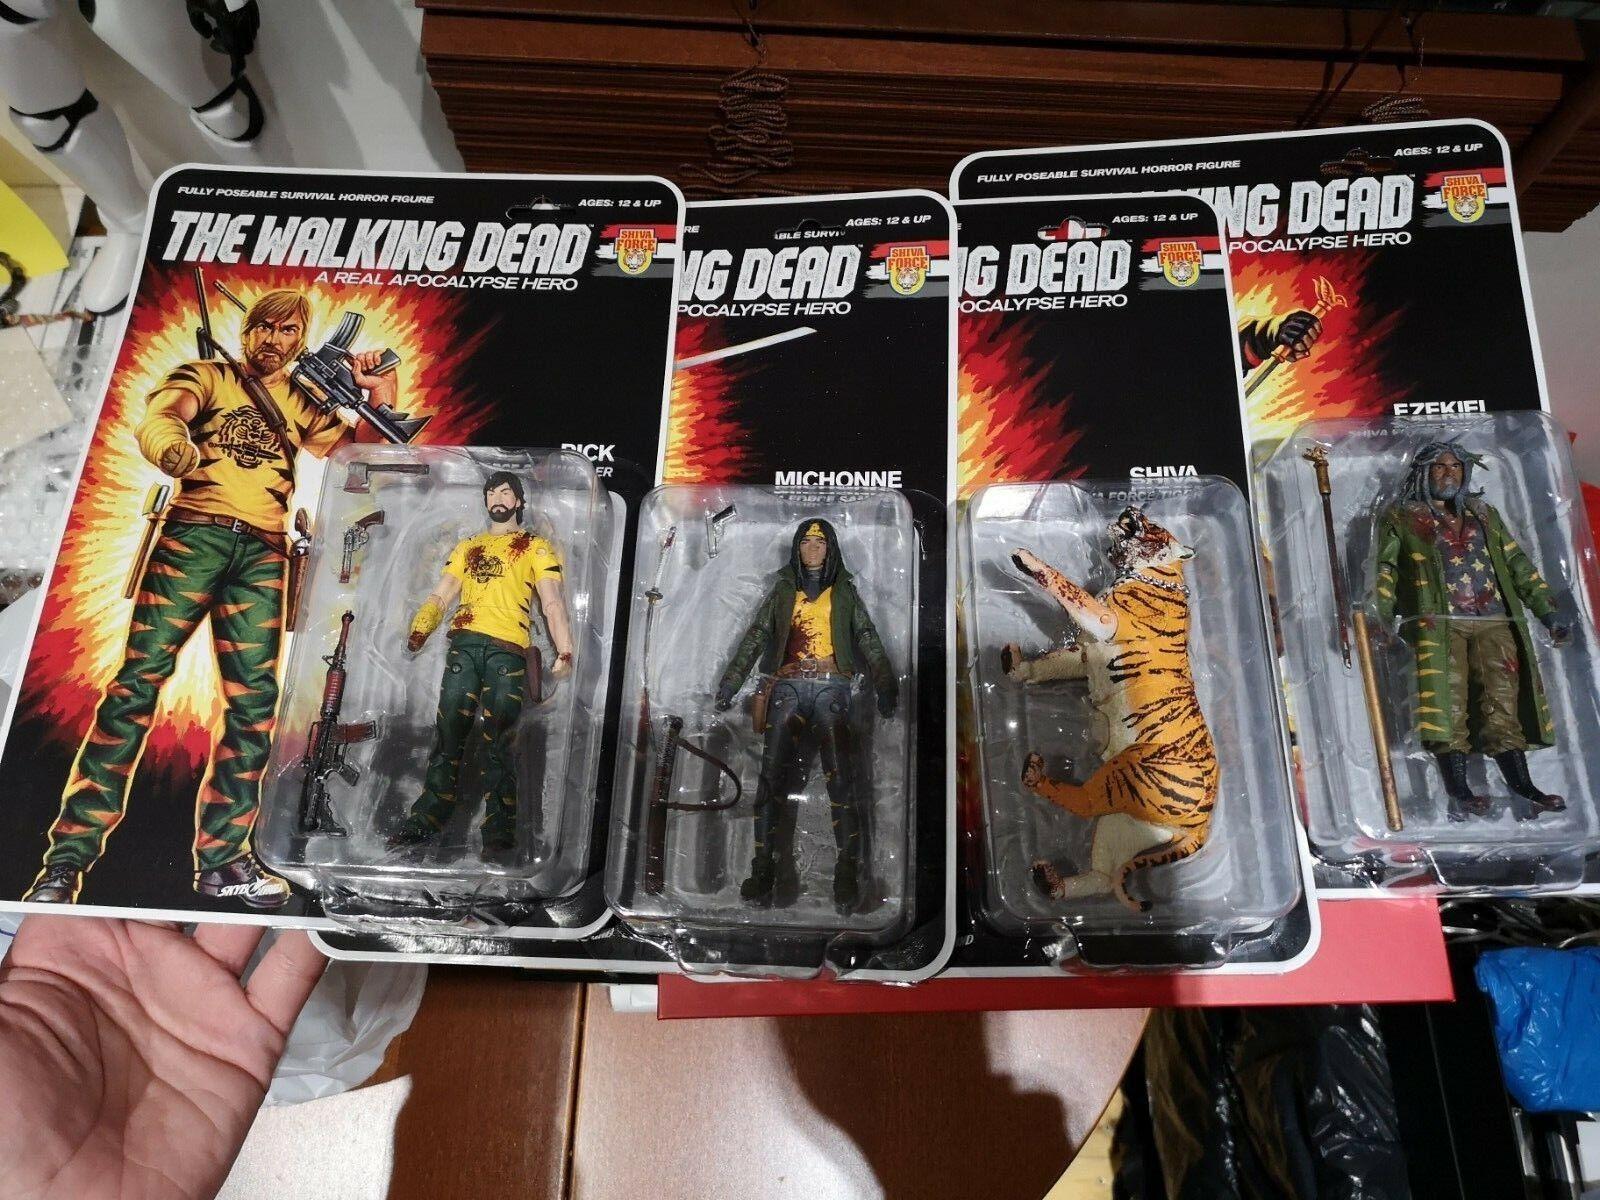 Walking Dead Action Figures GI Joe Style Style Style lot b4f3ef